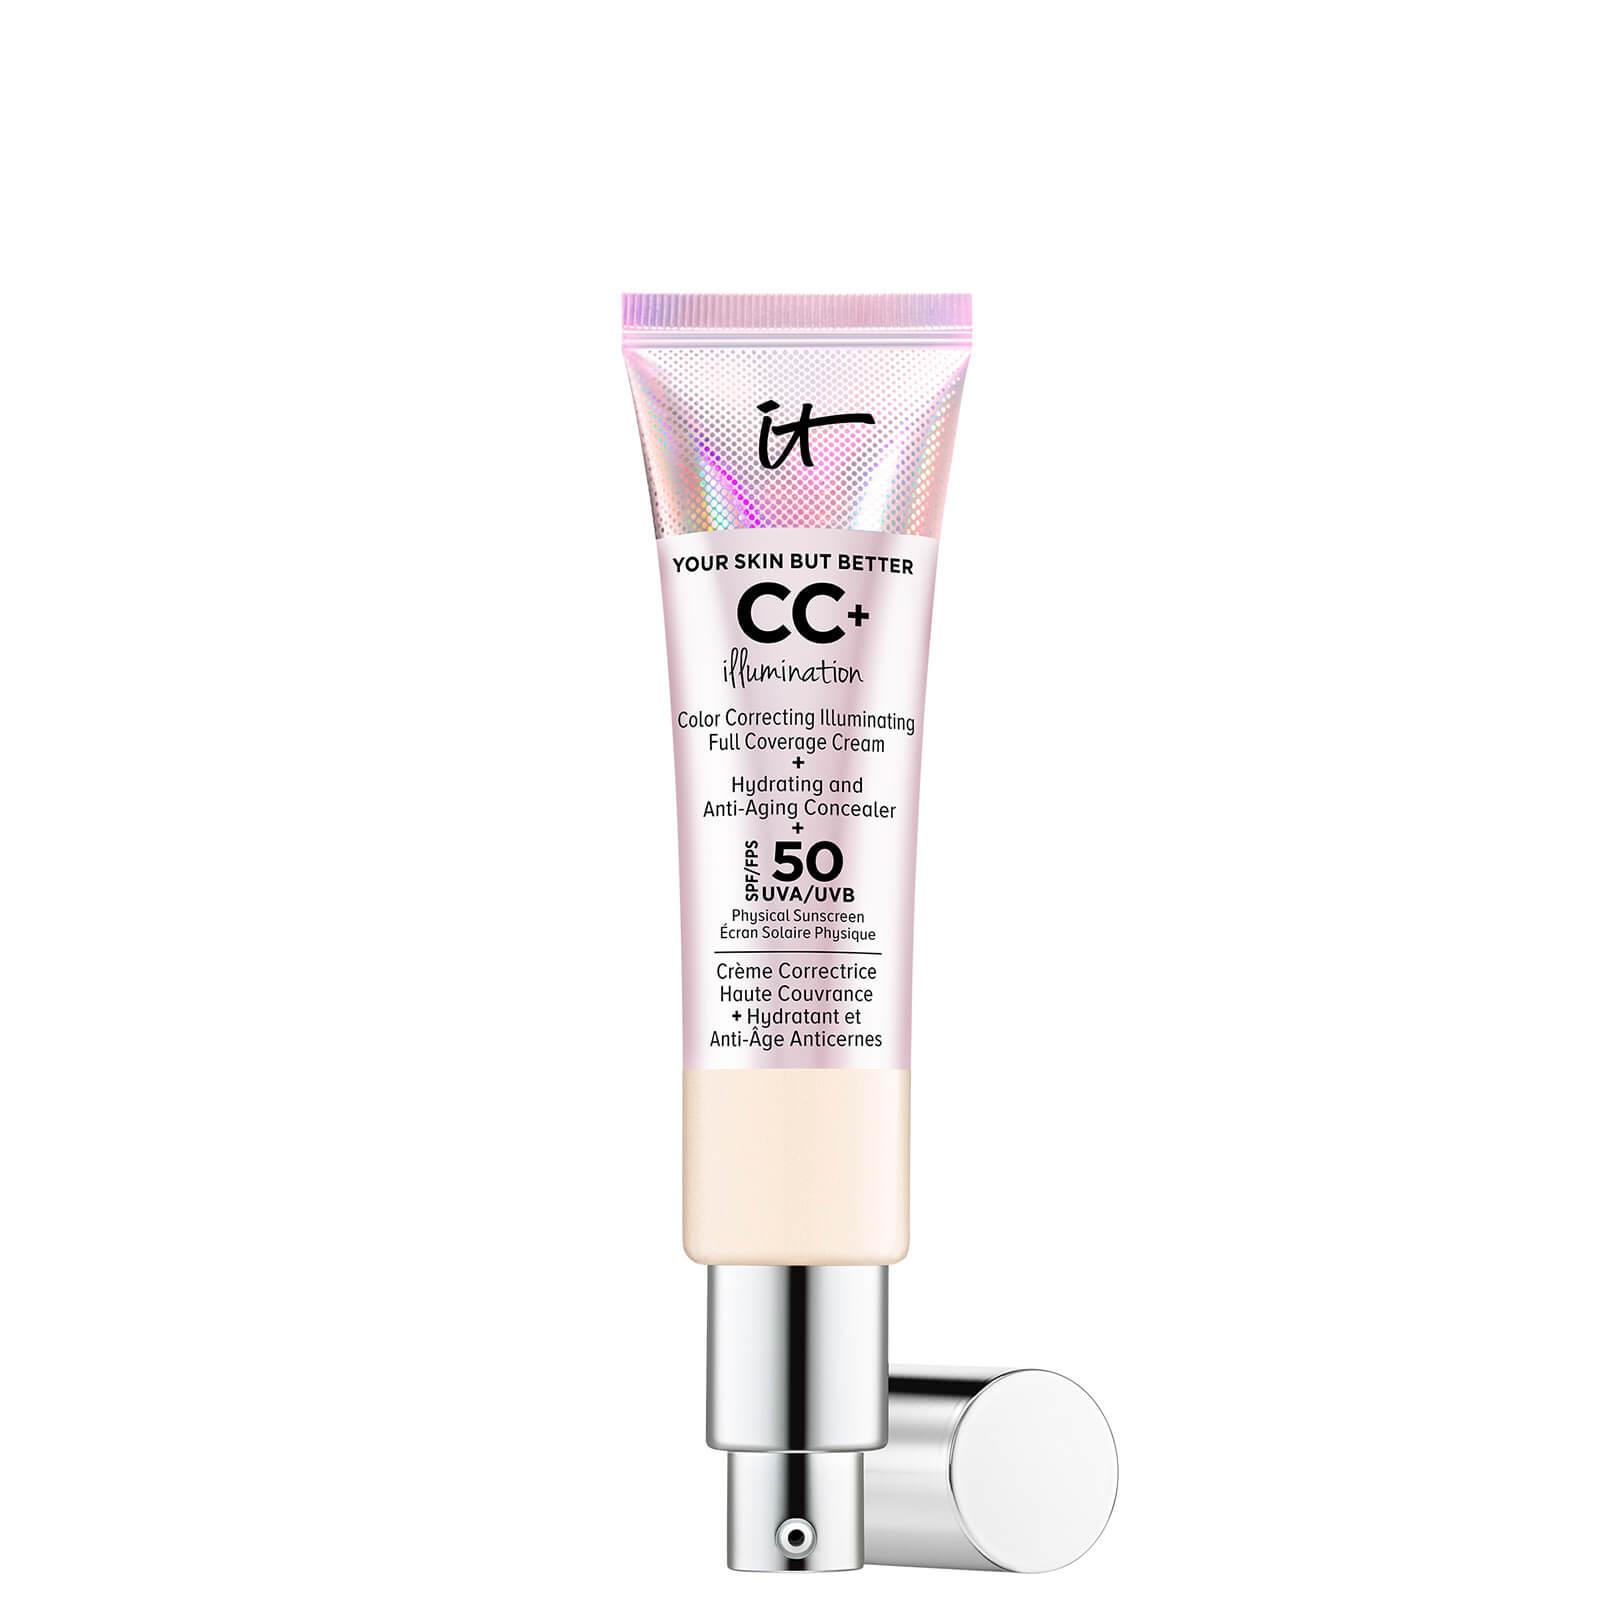 Купить IT Cosmetics Your Skin But Better CC+ Illumination SPF50 32ml (Various Shades) - Fair